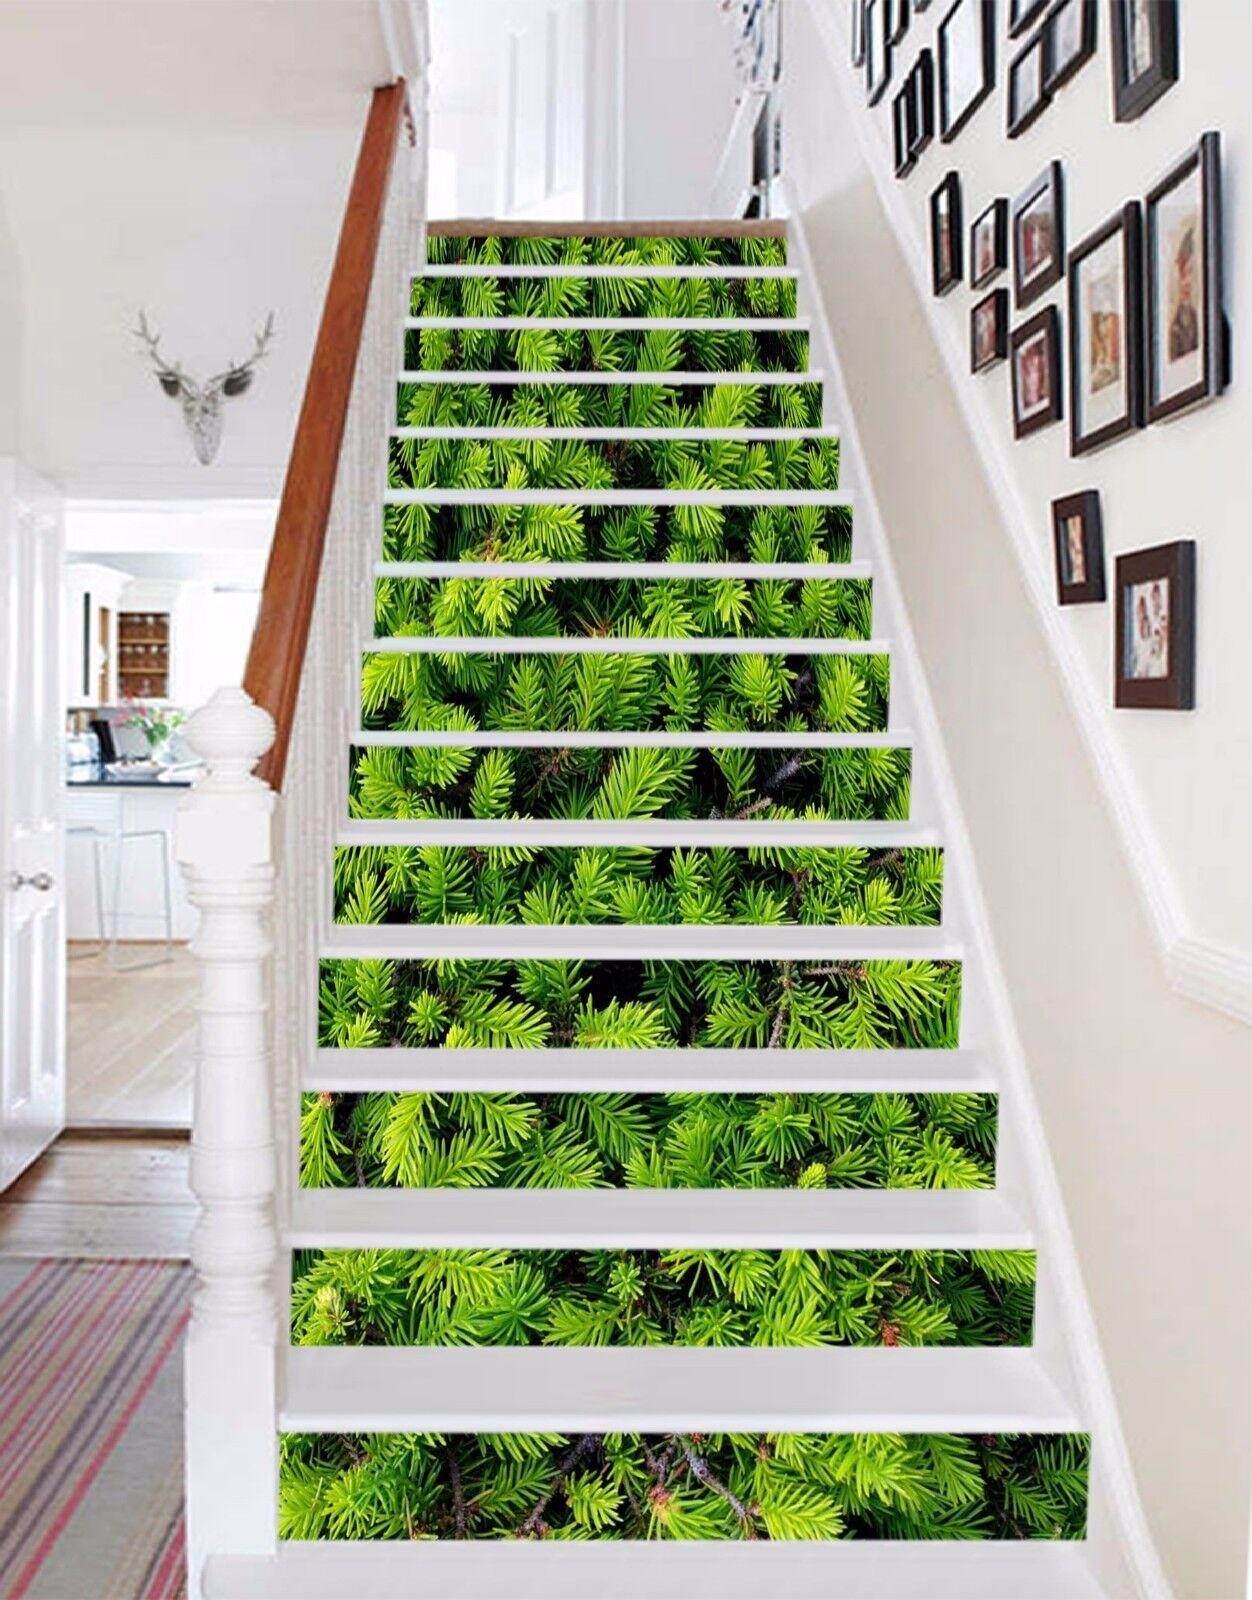 3D Grün leaves 7 Stair Risers Decoration Photo Mural Vinyl Decal Wallpaper UK